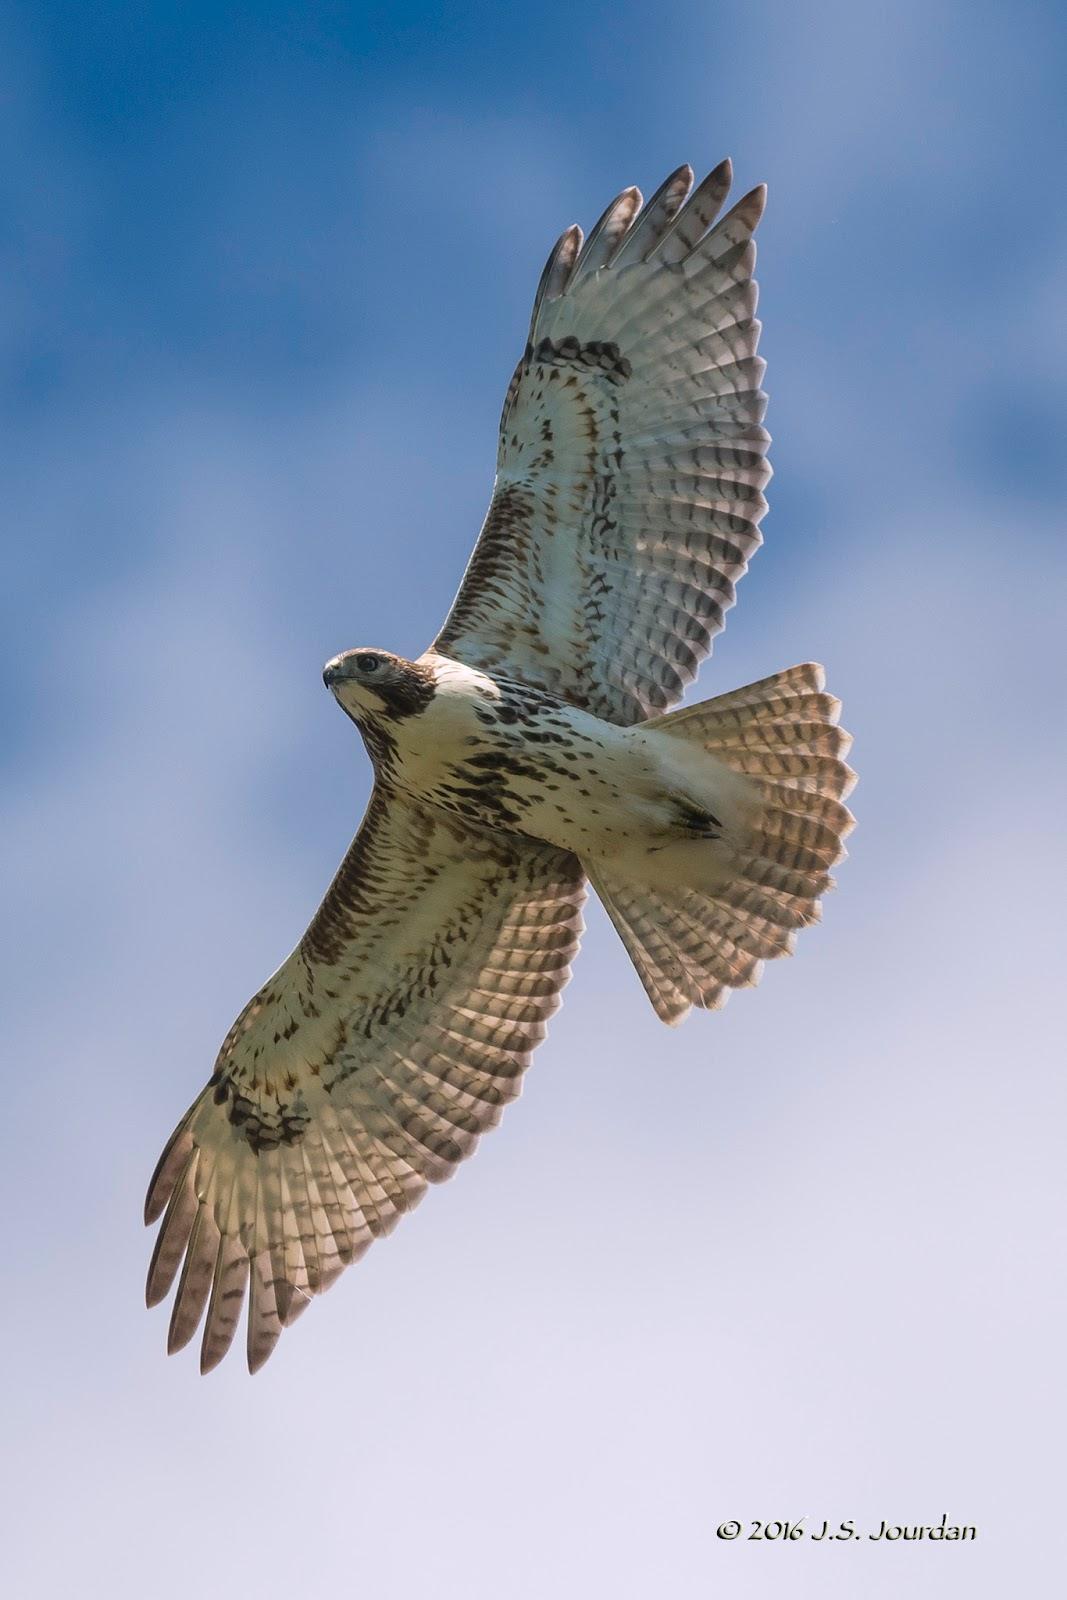 Jerry's Birding / Digiscoping Blog: Detroit River Hawk ...